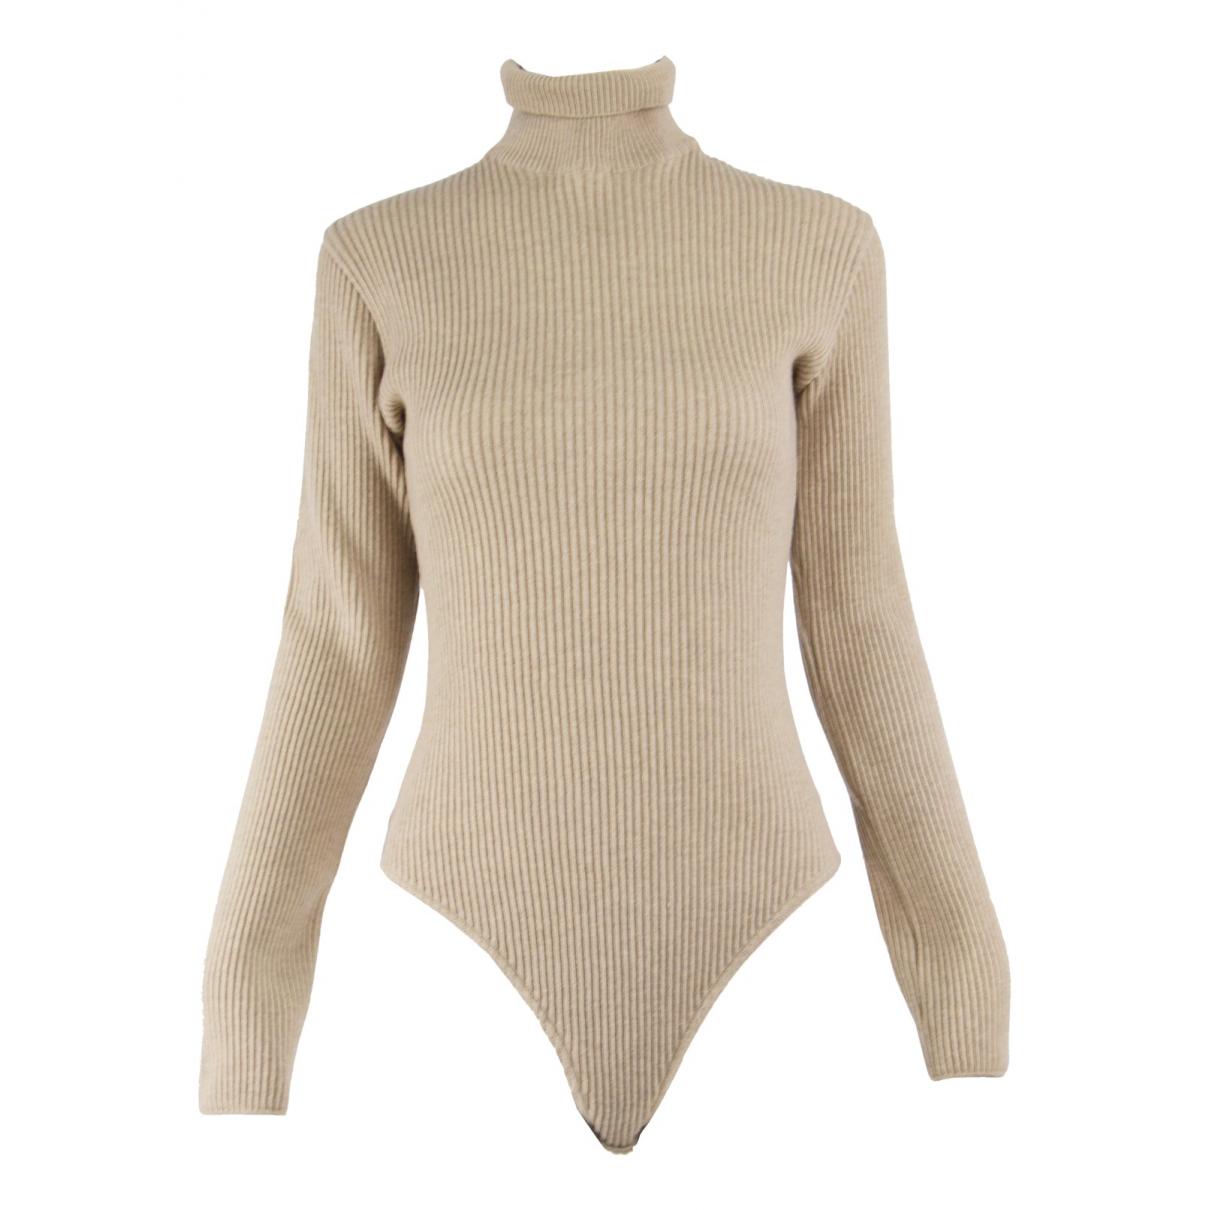 Genny N Beige Cashmere jumpsuit for Women M International